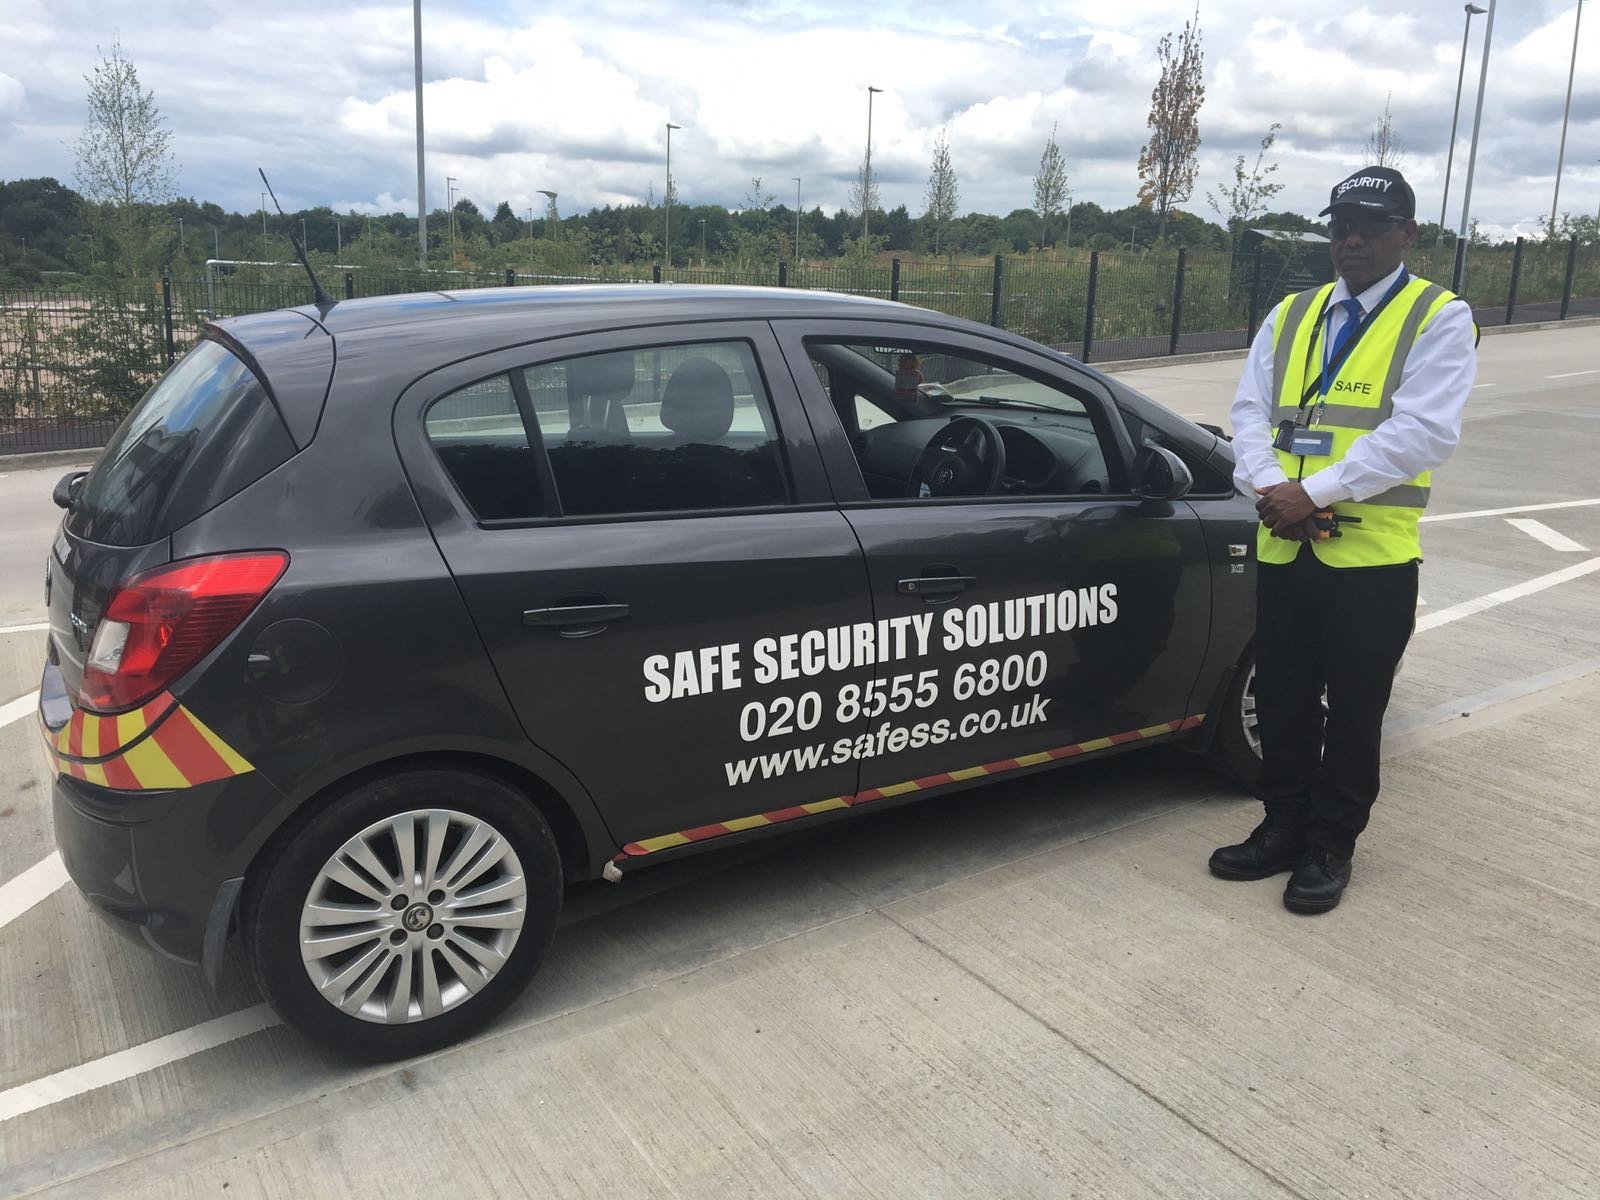 Security patrolling